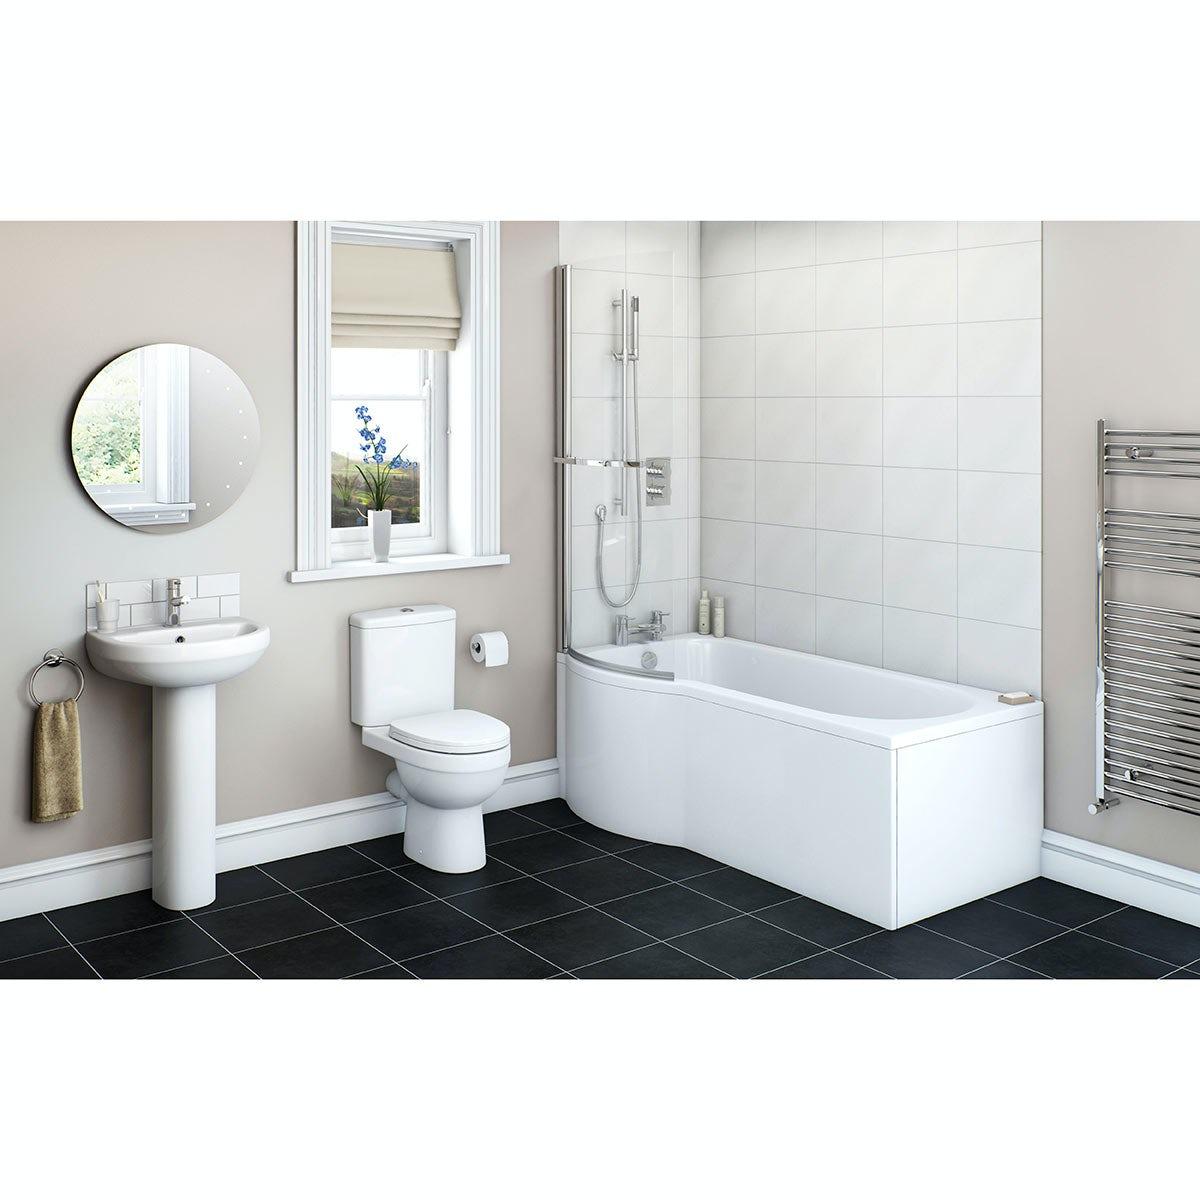 100 shower bath suites bathroom luxury master bathroom shower bath suites orchard eden bathroom suite with left handed p shaped shower bath